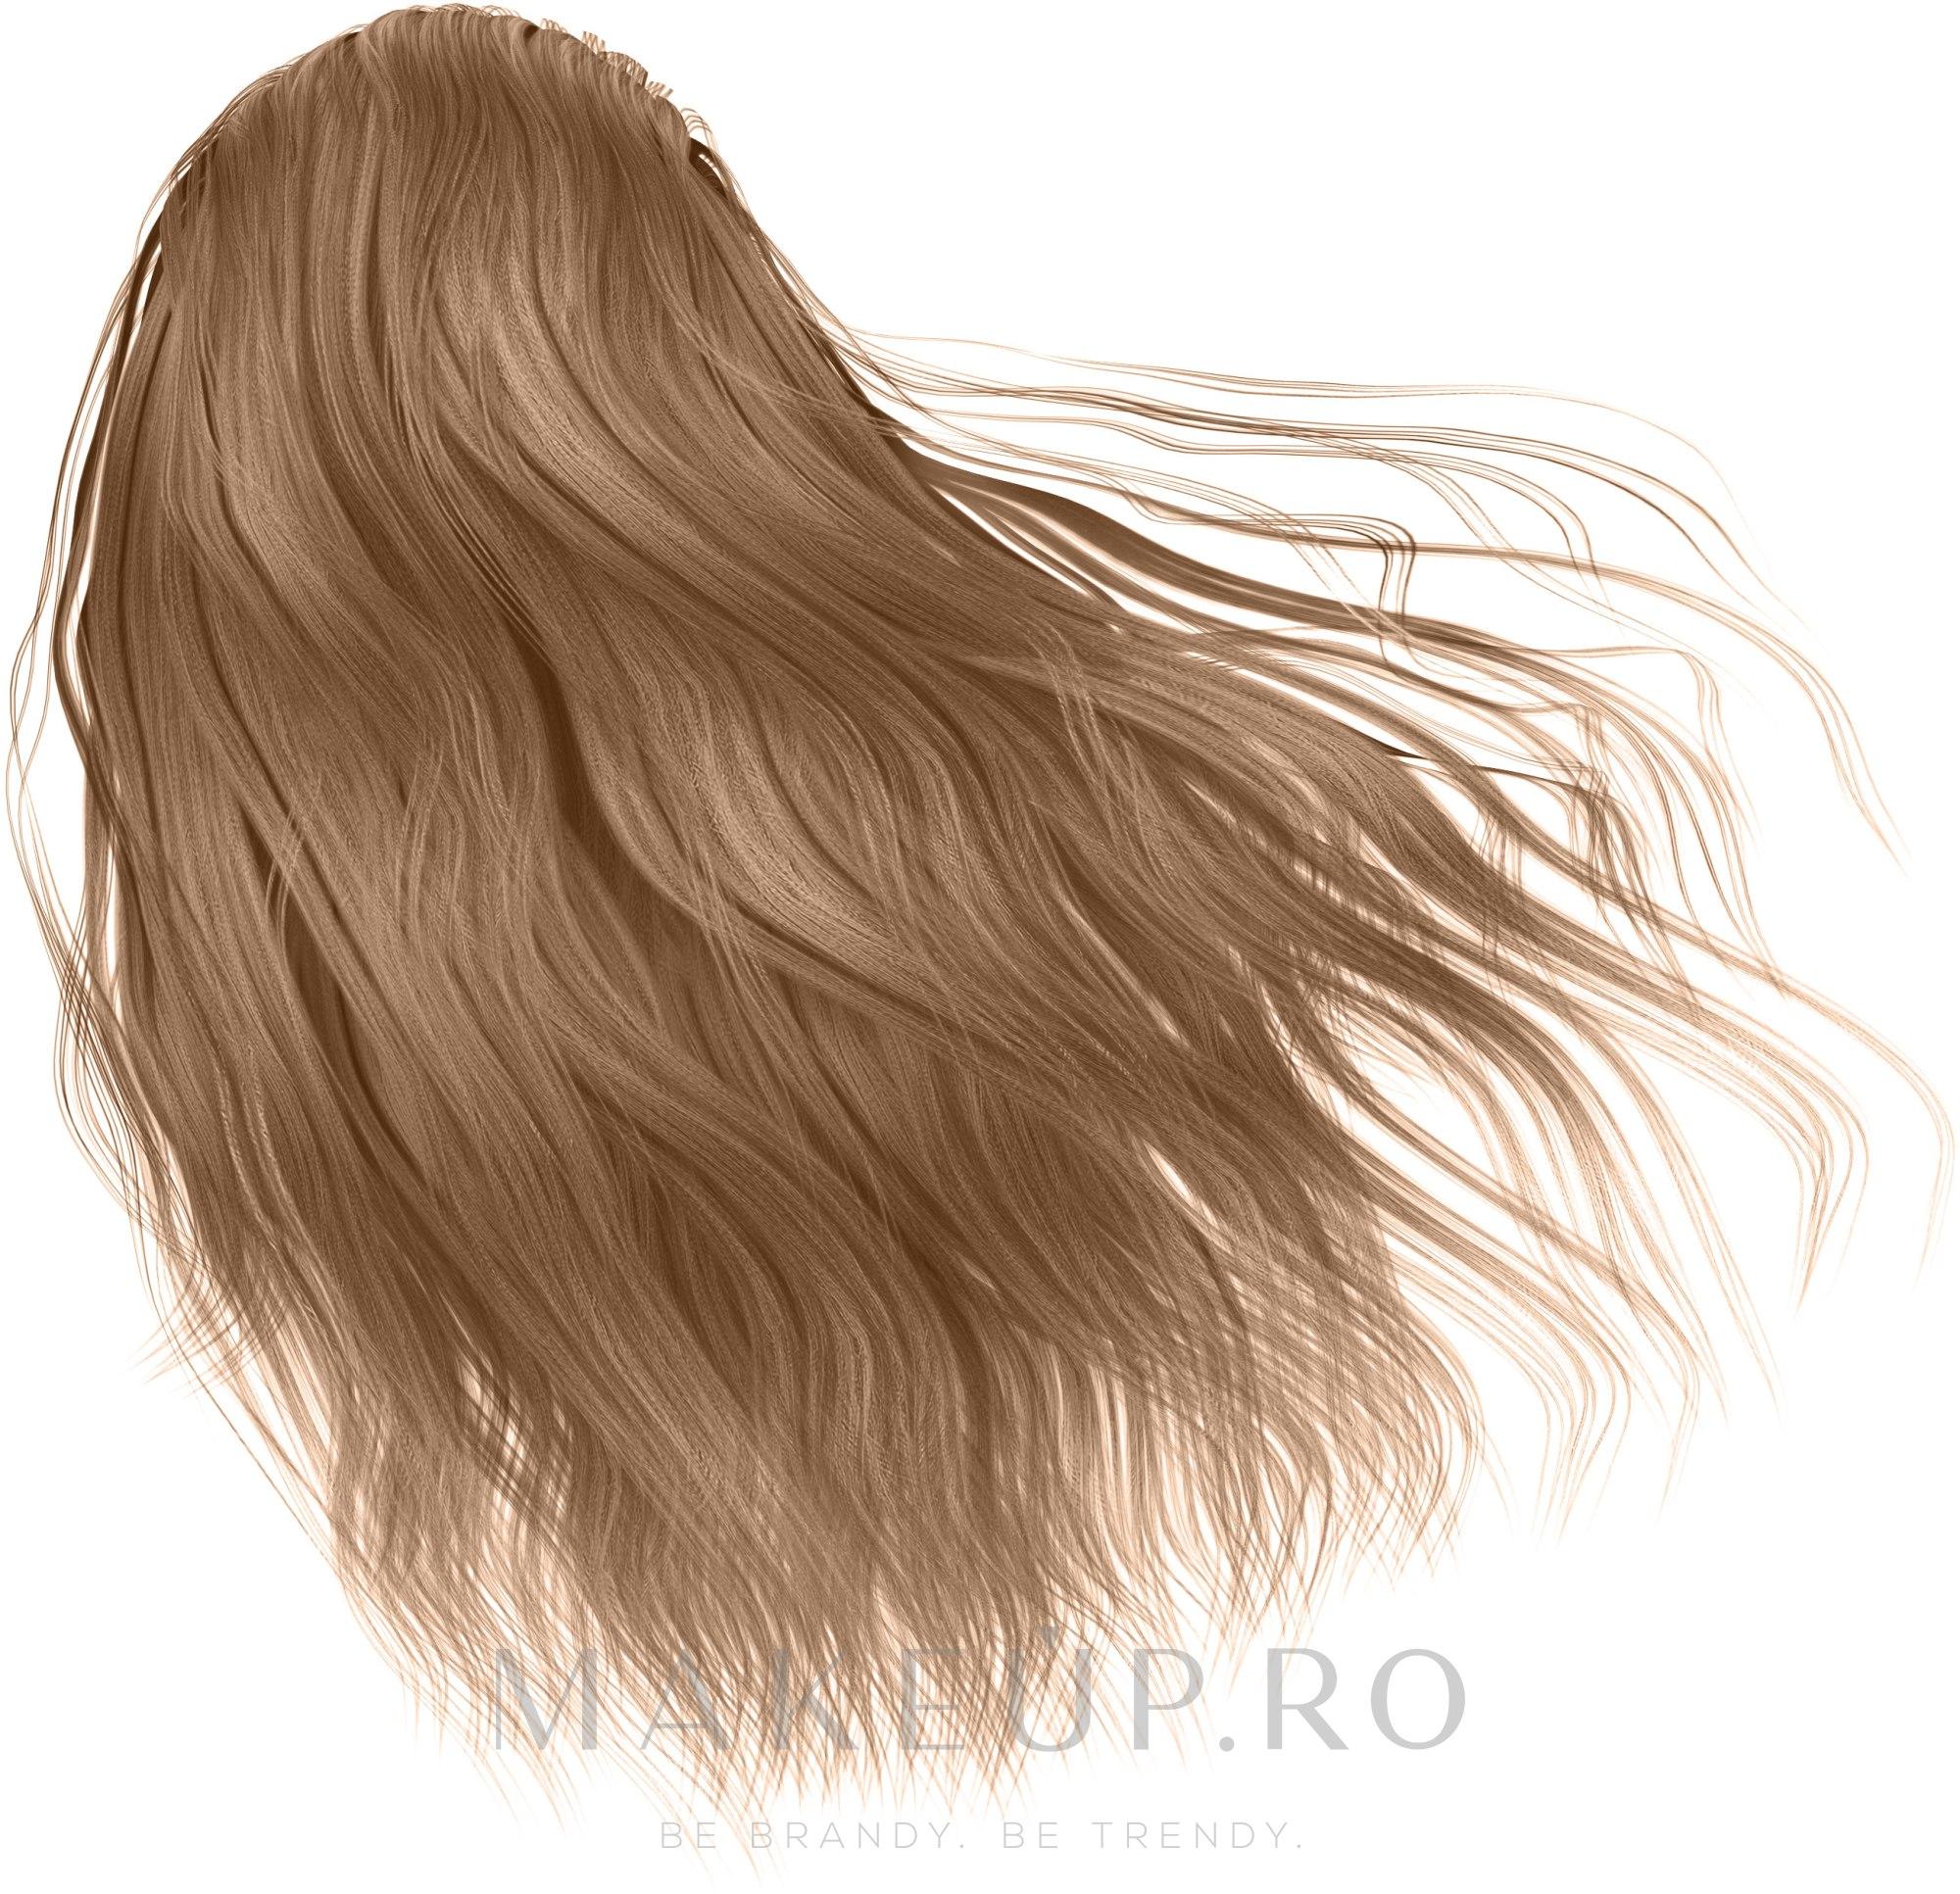 Vopsea de păr cremă - Revlon Professional Revlonissimo NMT — Imagine 6.35 - Ciemny Bursztynowy Blond